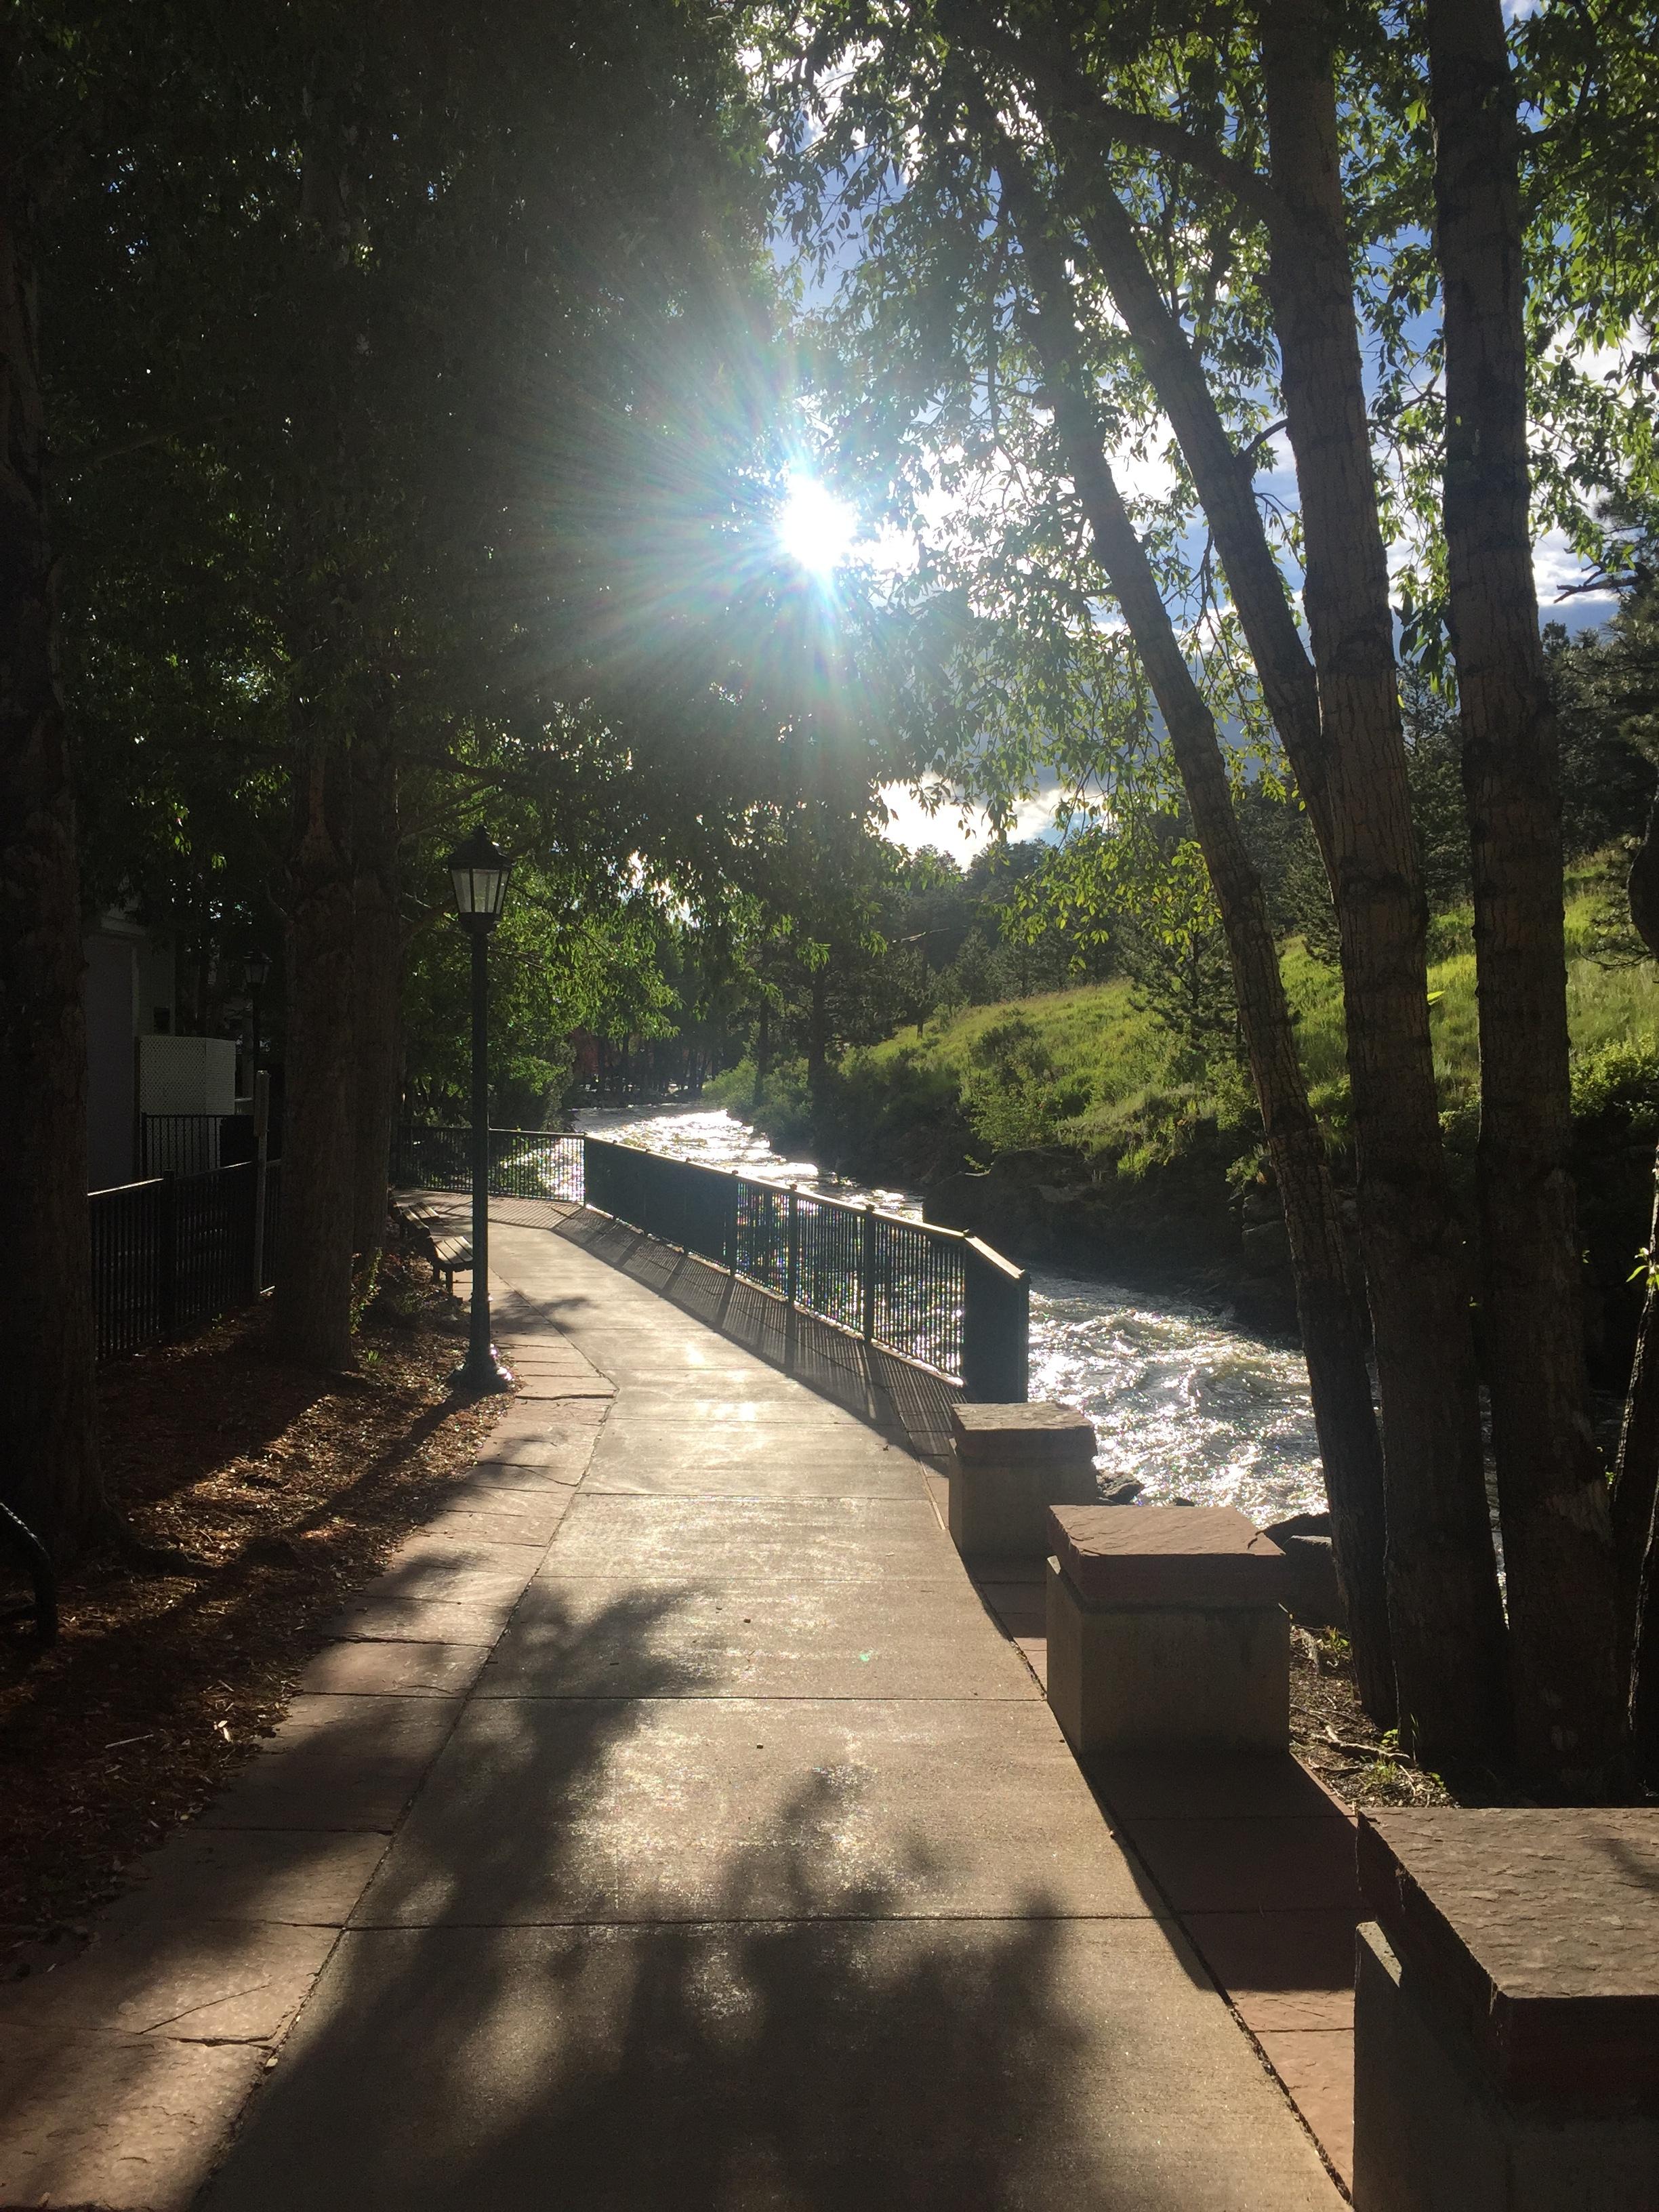 Stroll along the Riverwalk